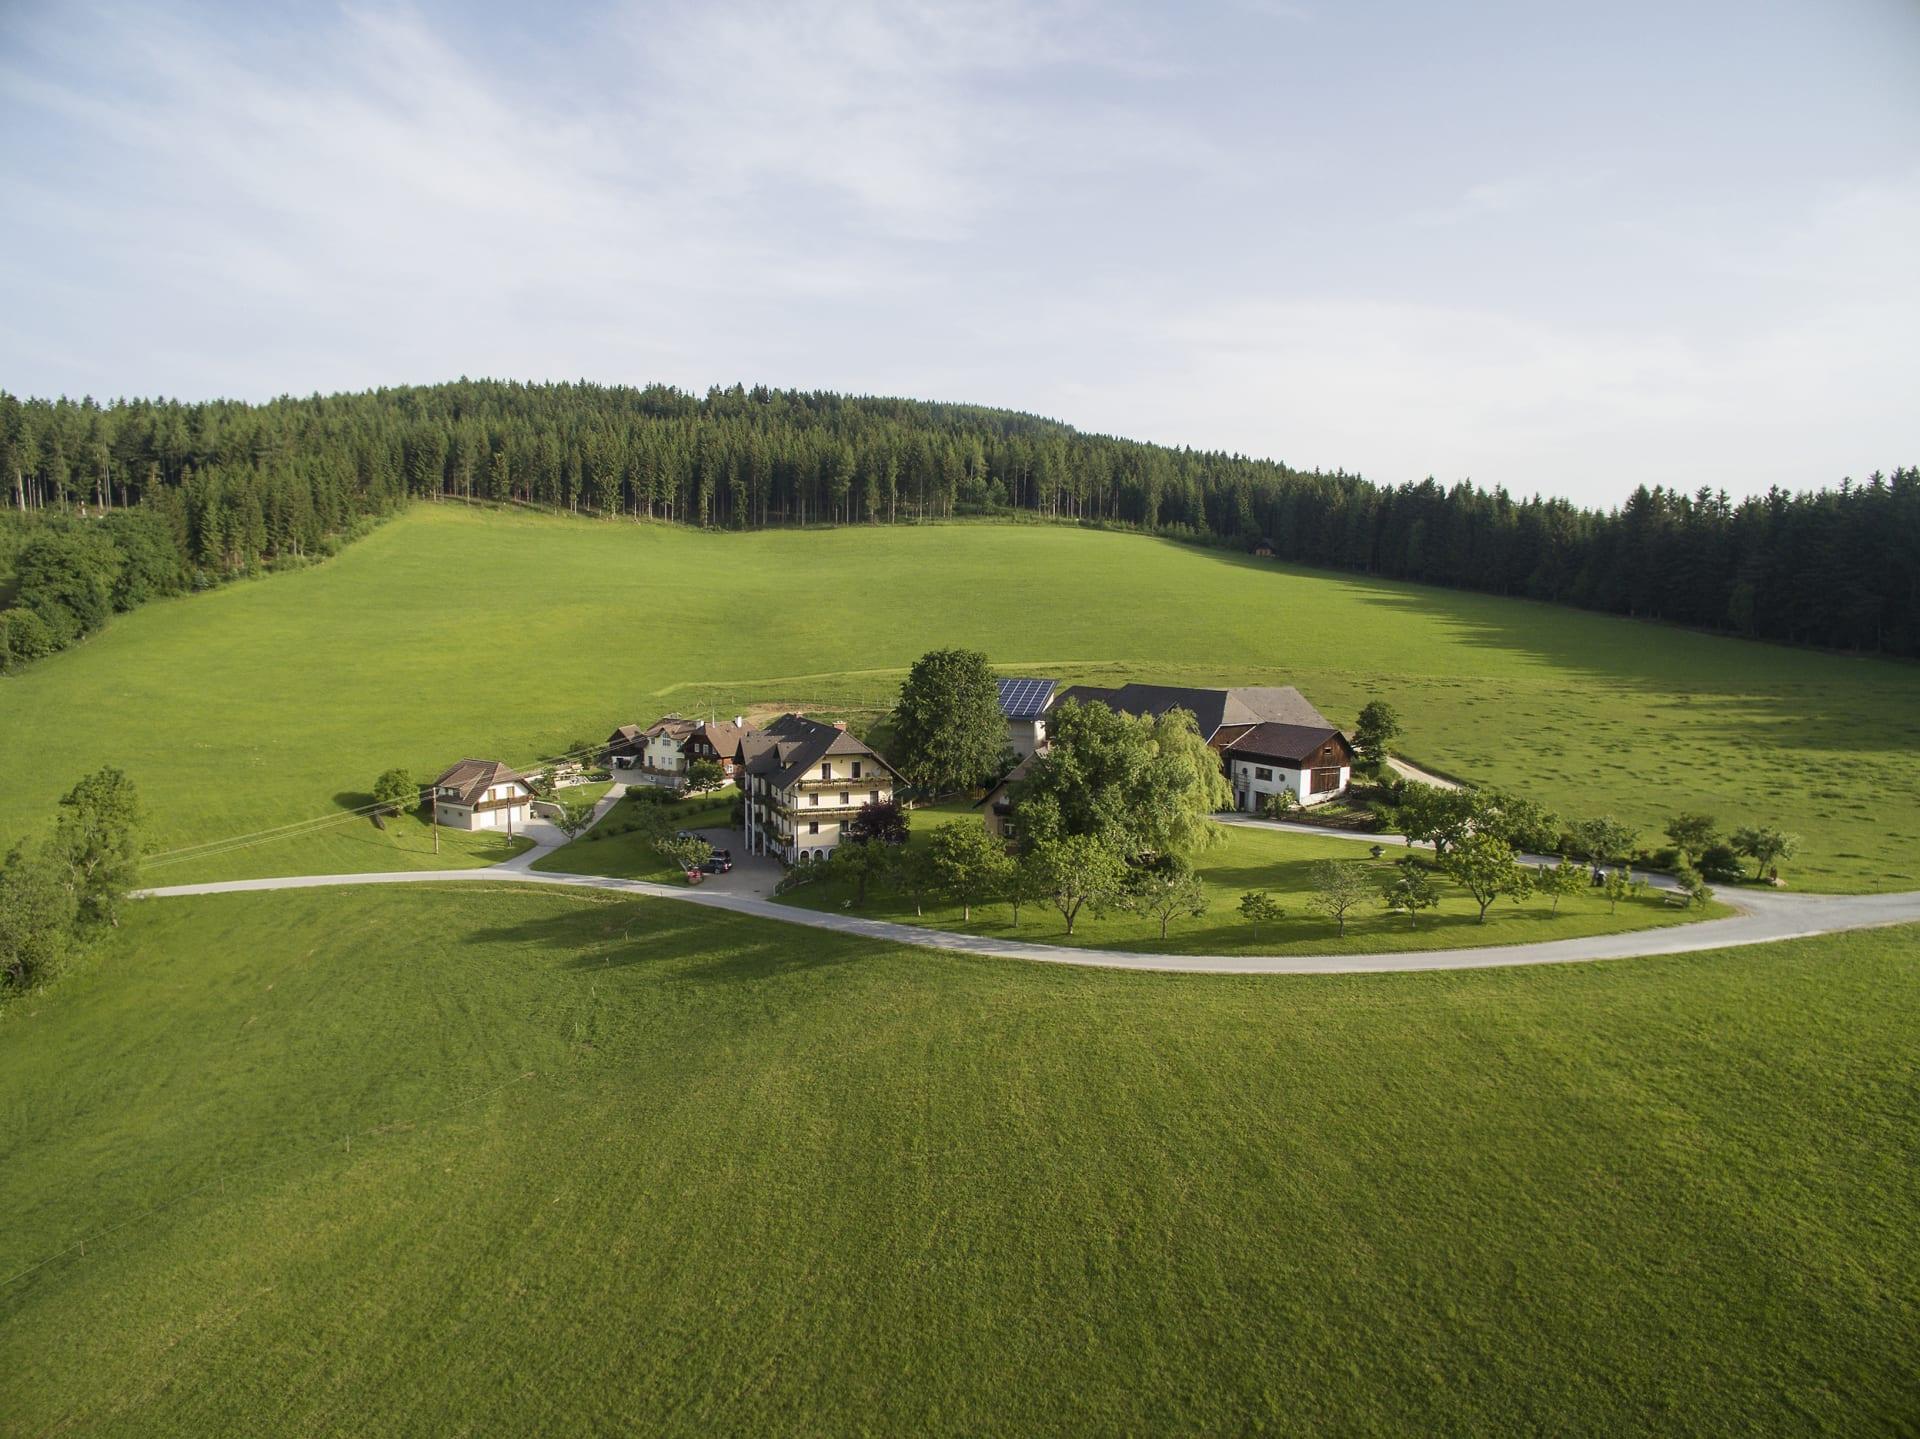 Bauernhof Hönigshof